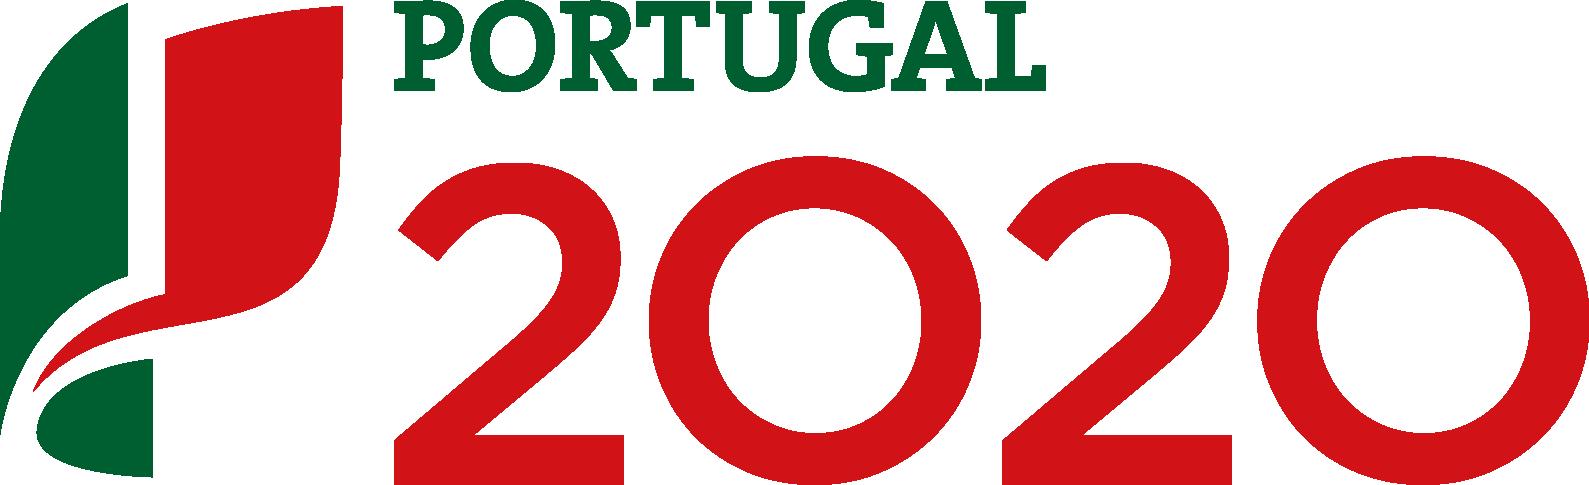 logo Portugal2020